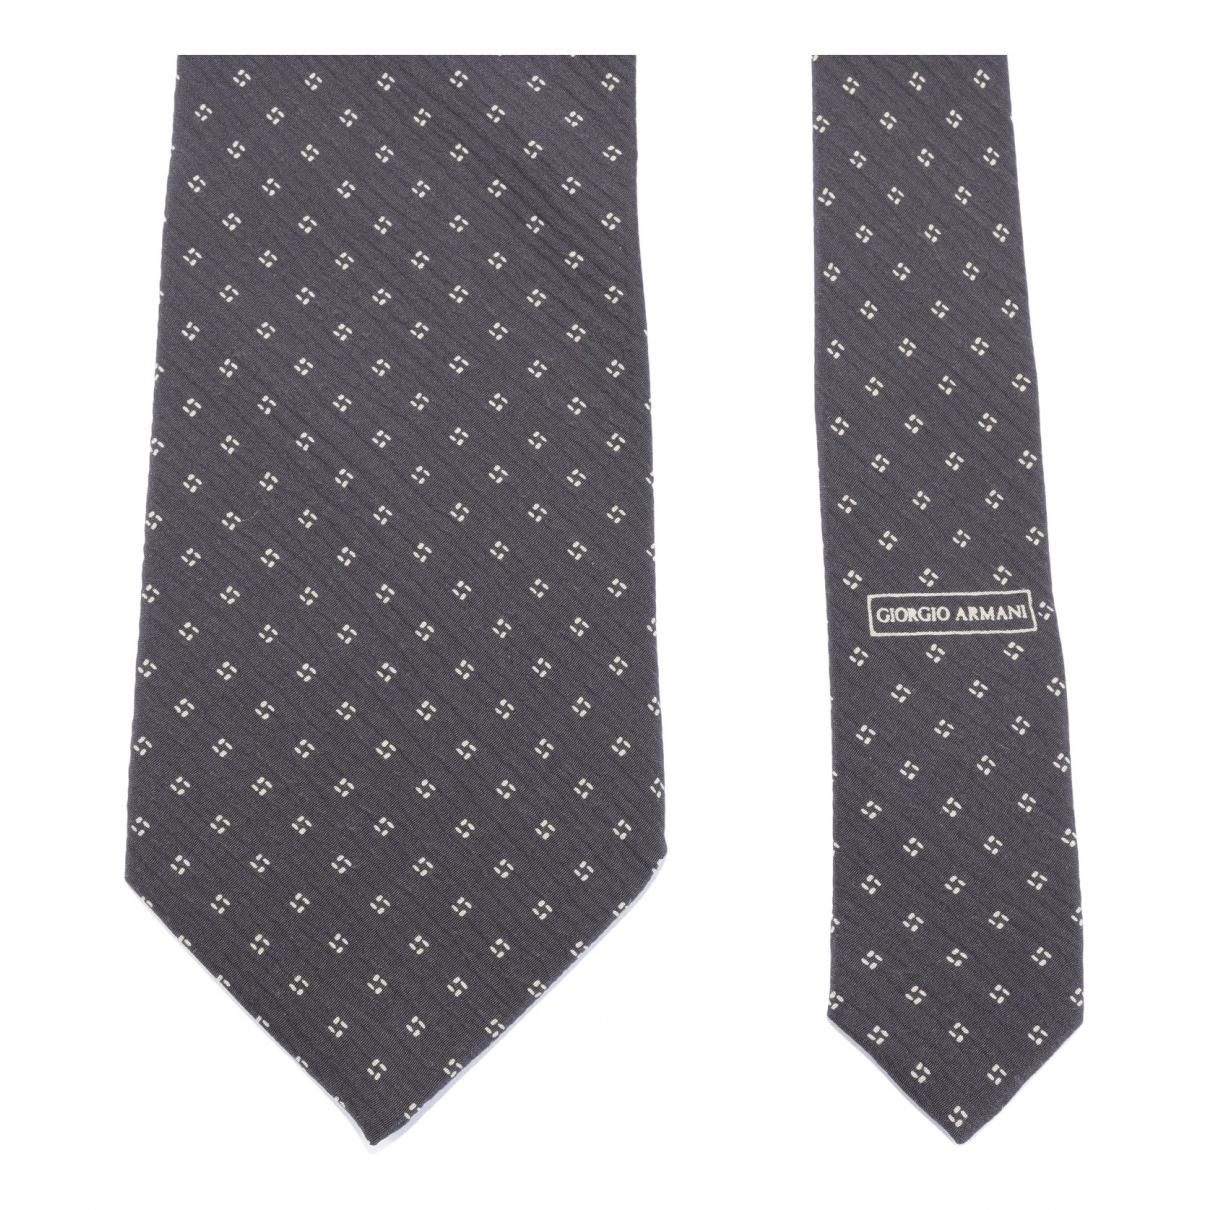 Giorgio Armani N Black Silk Ties for Men N